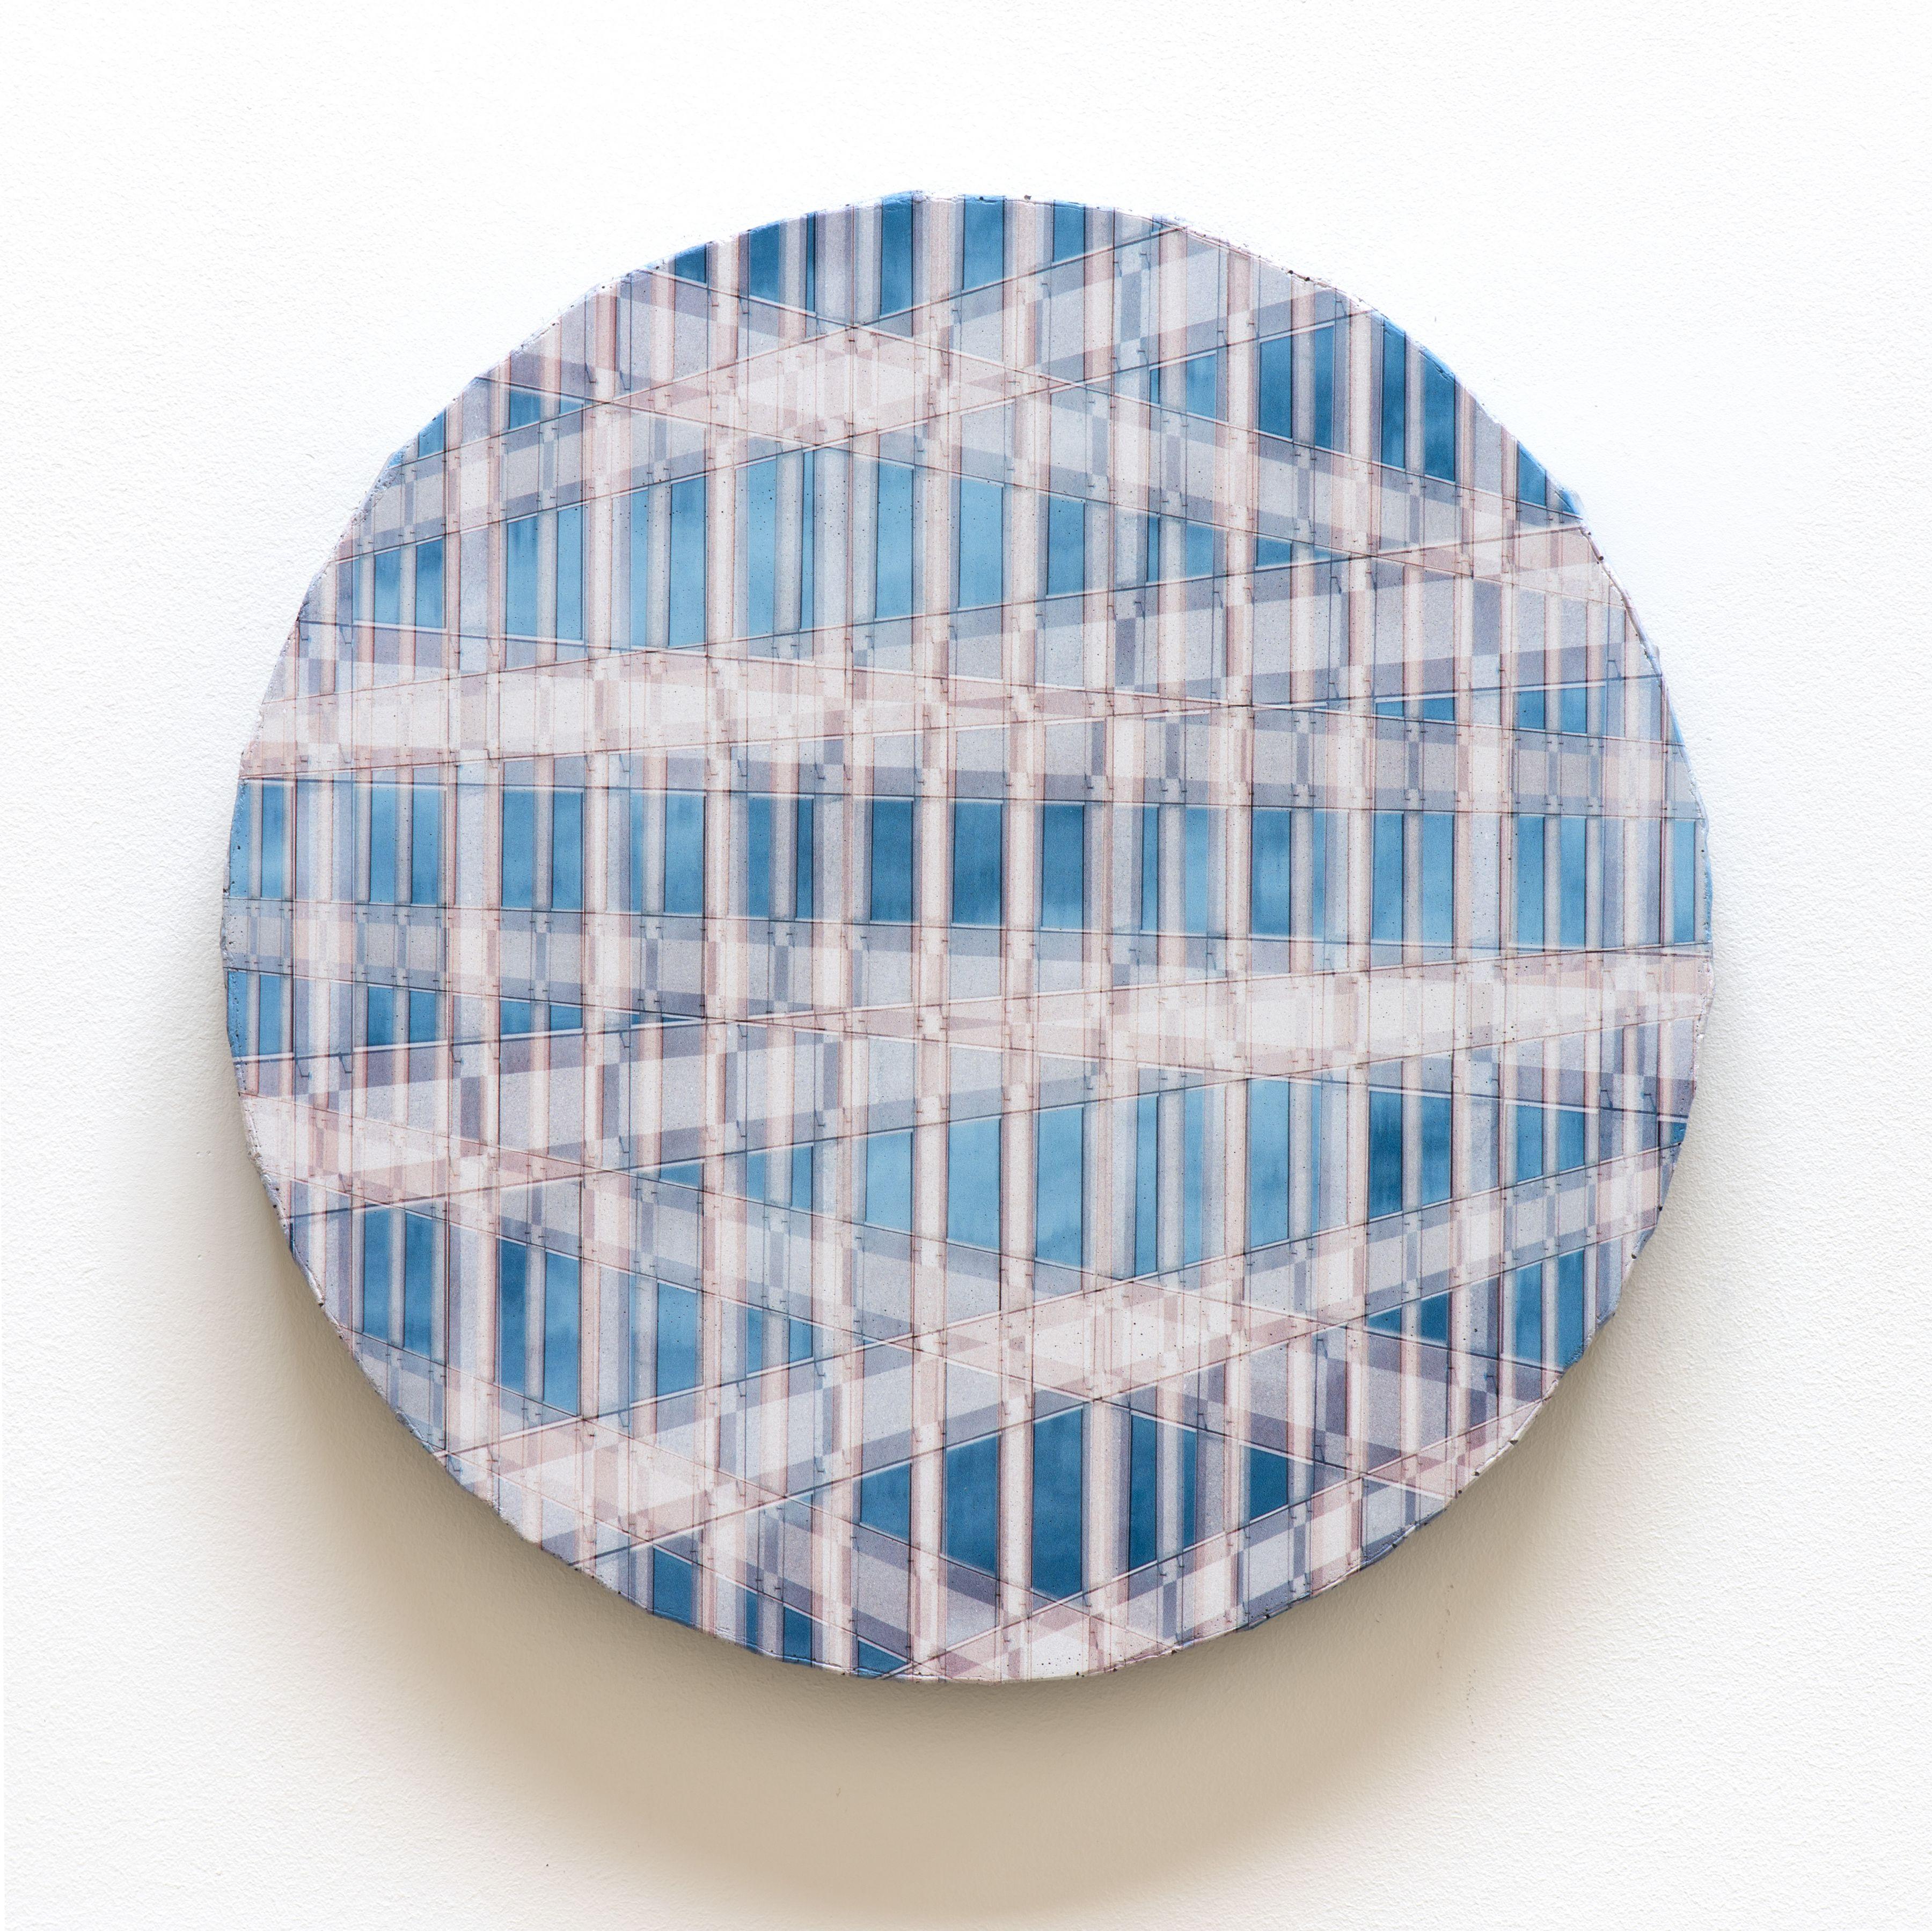 "Adam Moskowitz, Counterform Tondo, 2017, UV ink on concrete, 16 1/2"" x 16 1/2"" x 1 1/2"" at Anita Rogers Gallery"